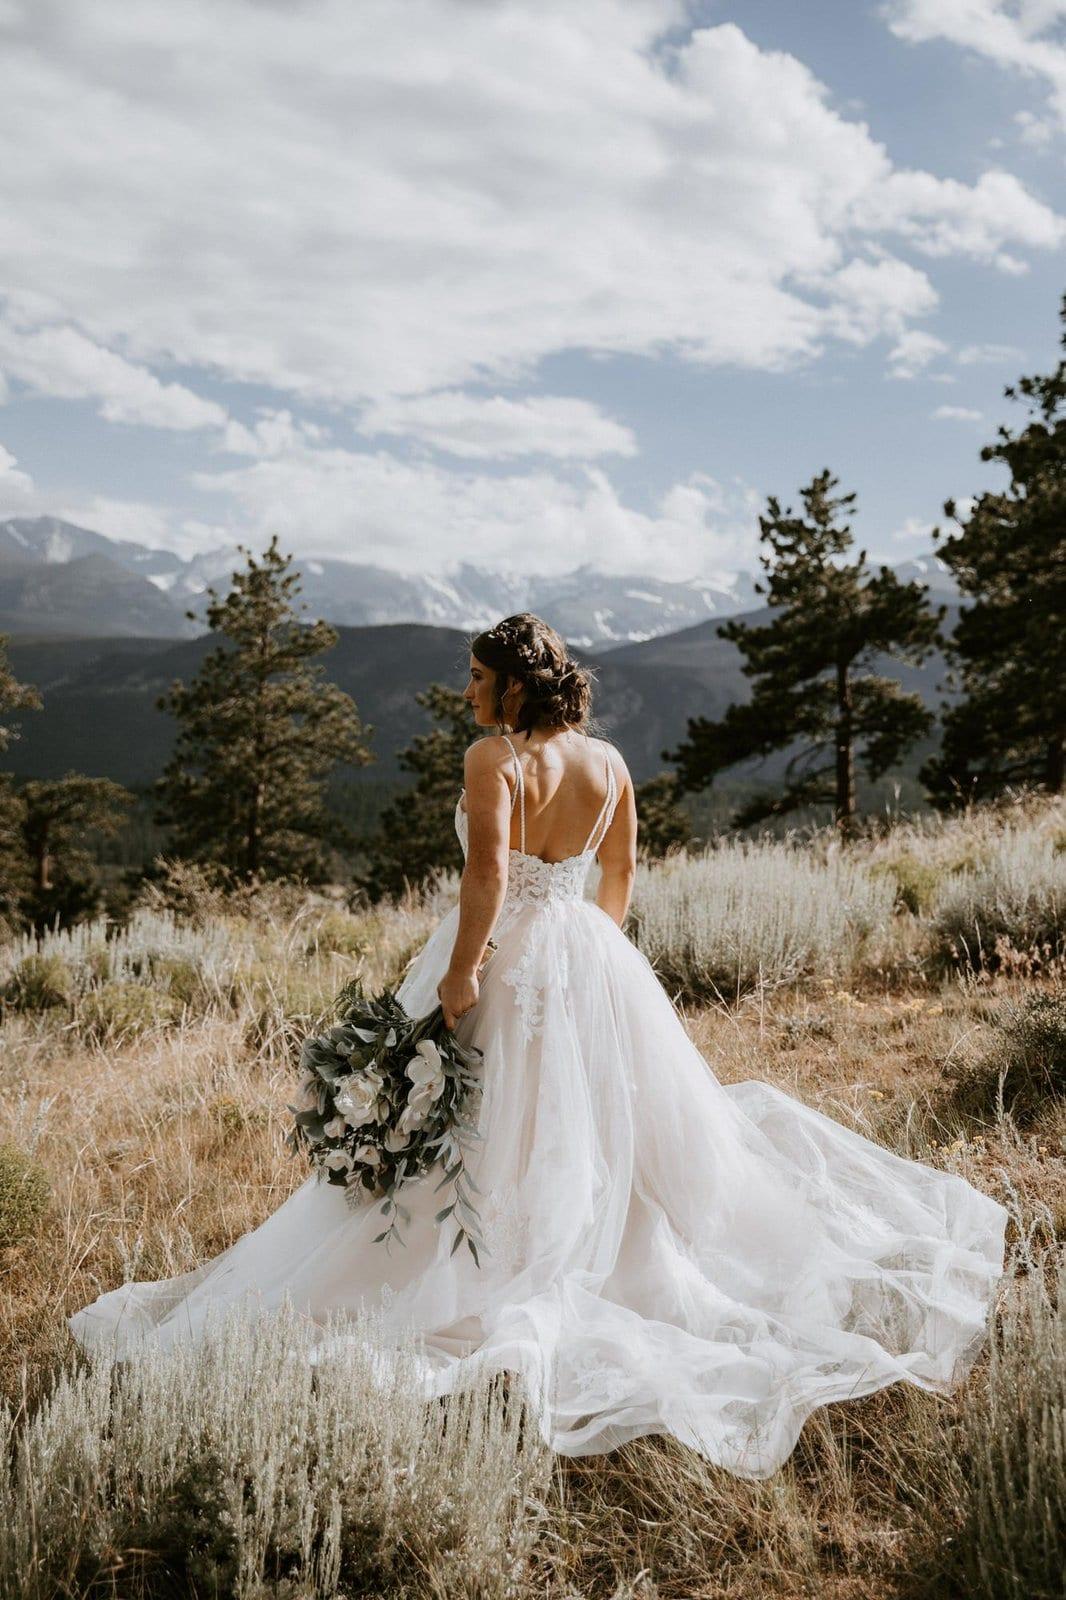 Essence of Australia dress in Rocky Mountain National Park.